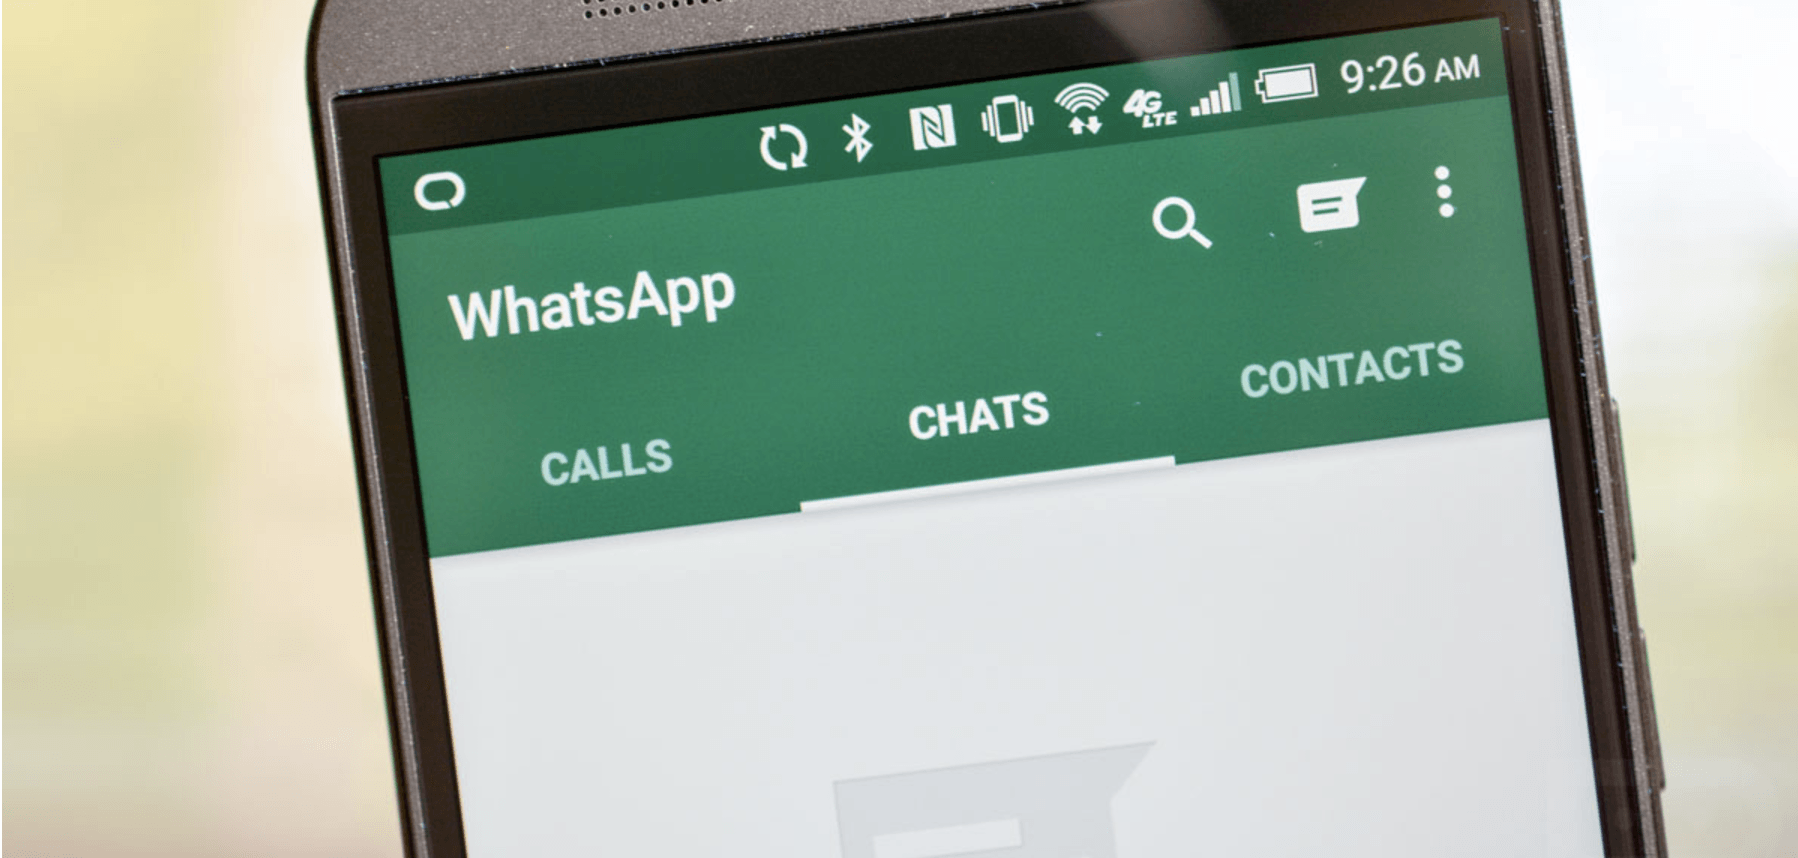 WhatsApp permettra de rétracter un message envoyé